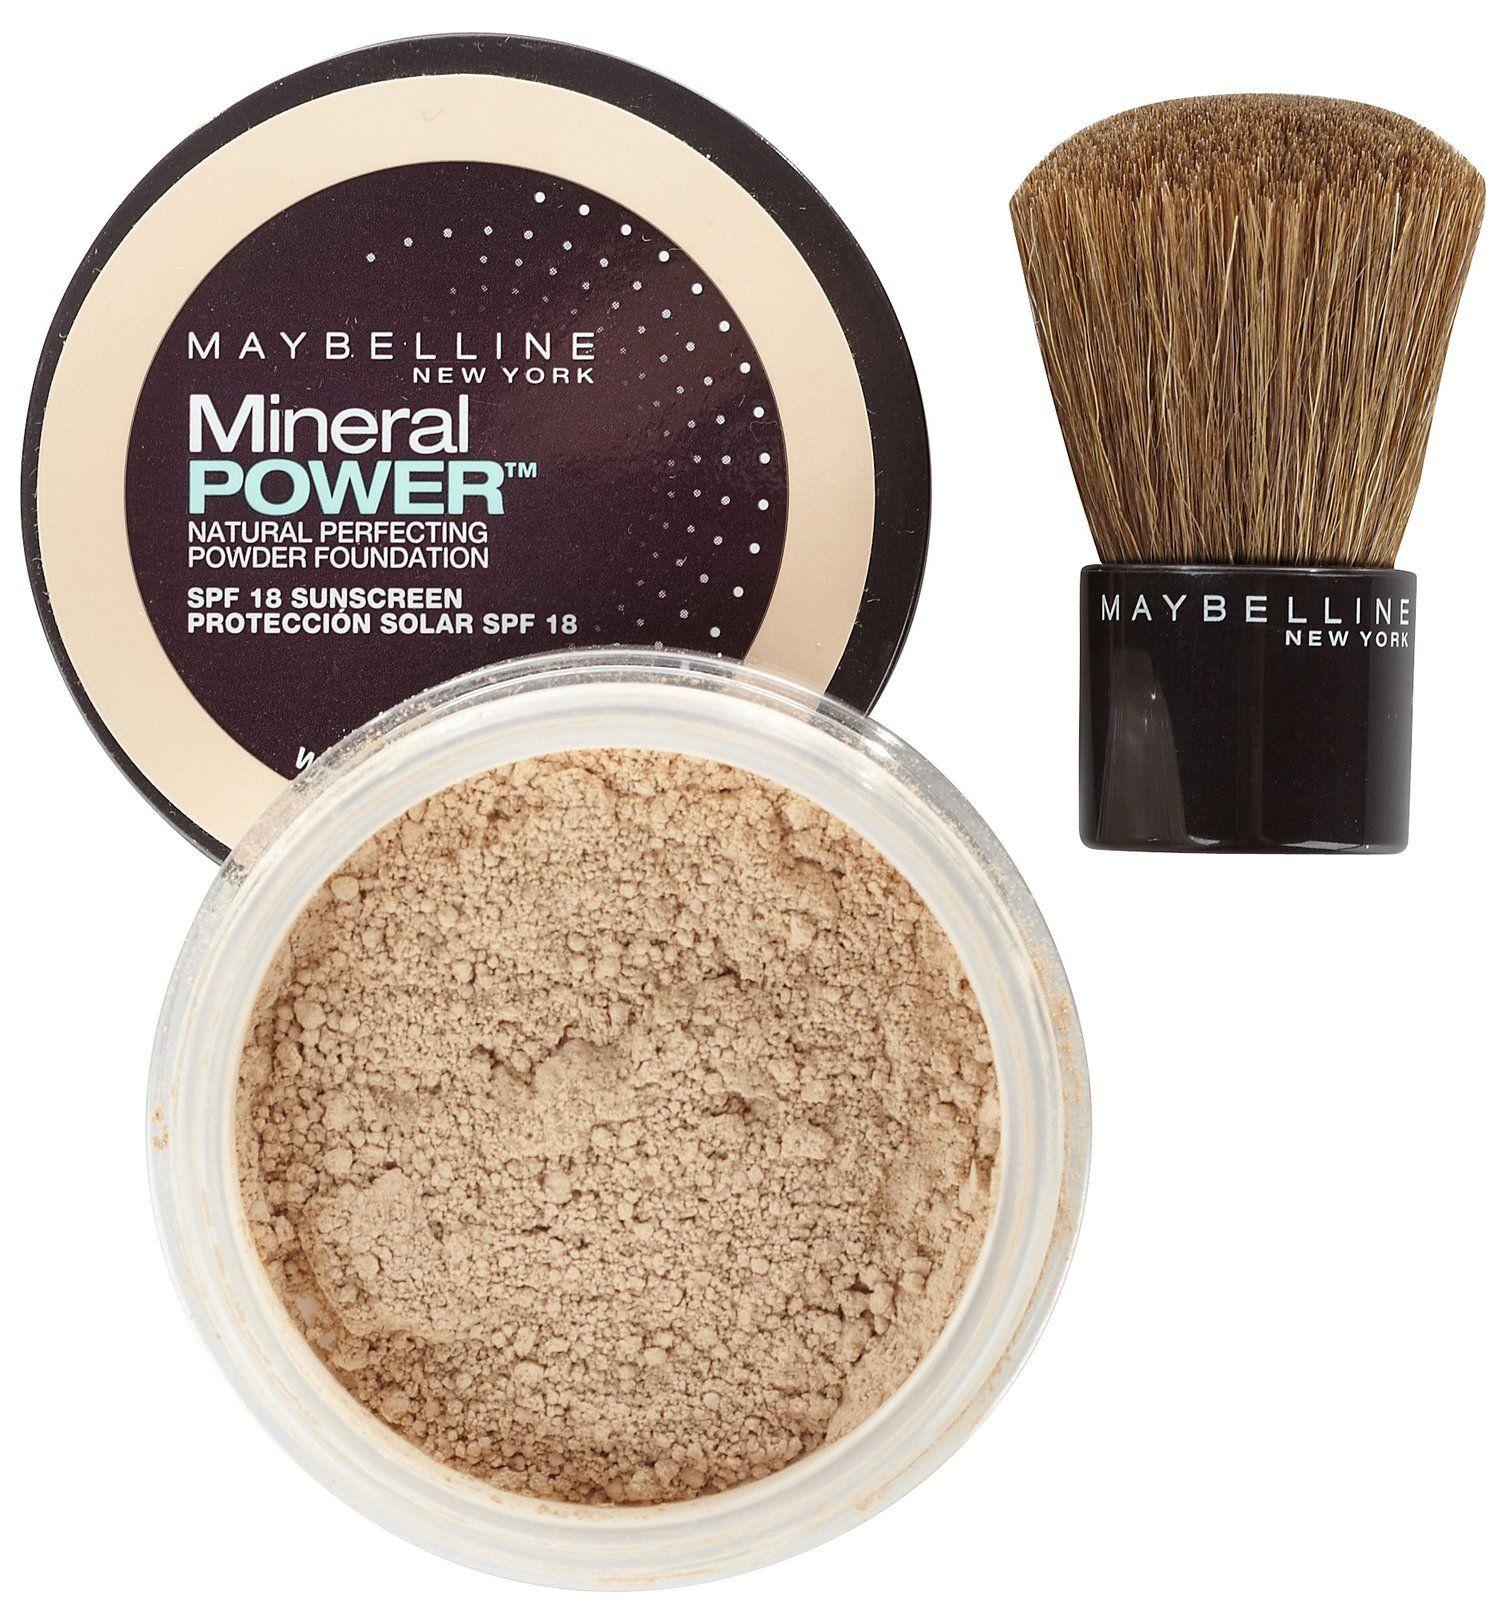 Savvy Minerals Makeup Line